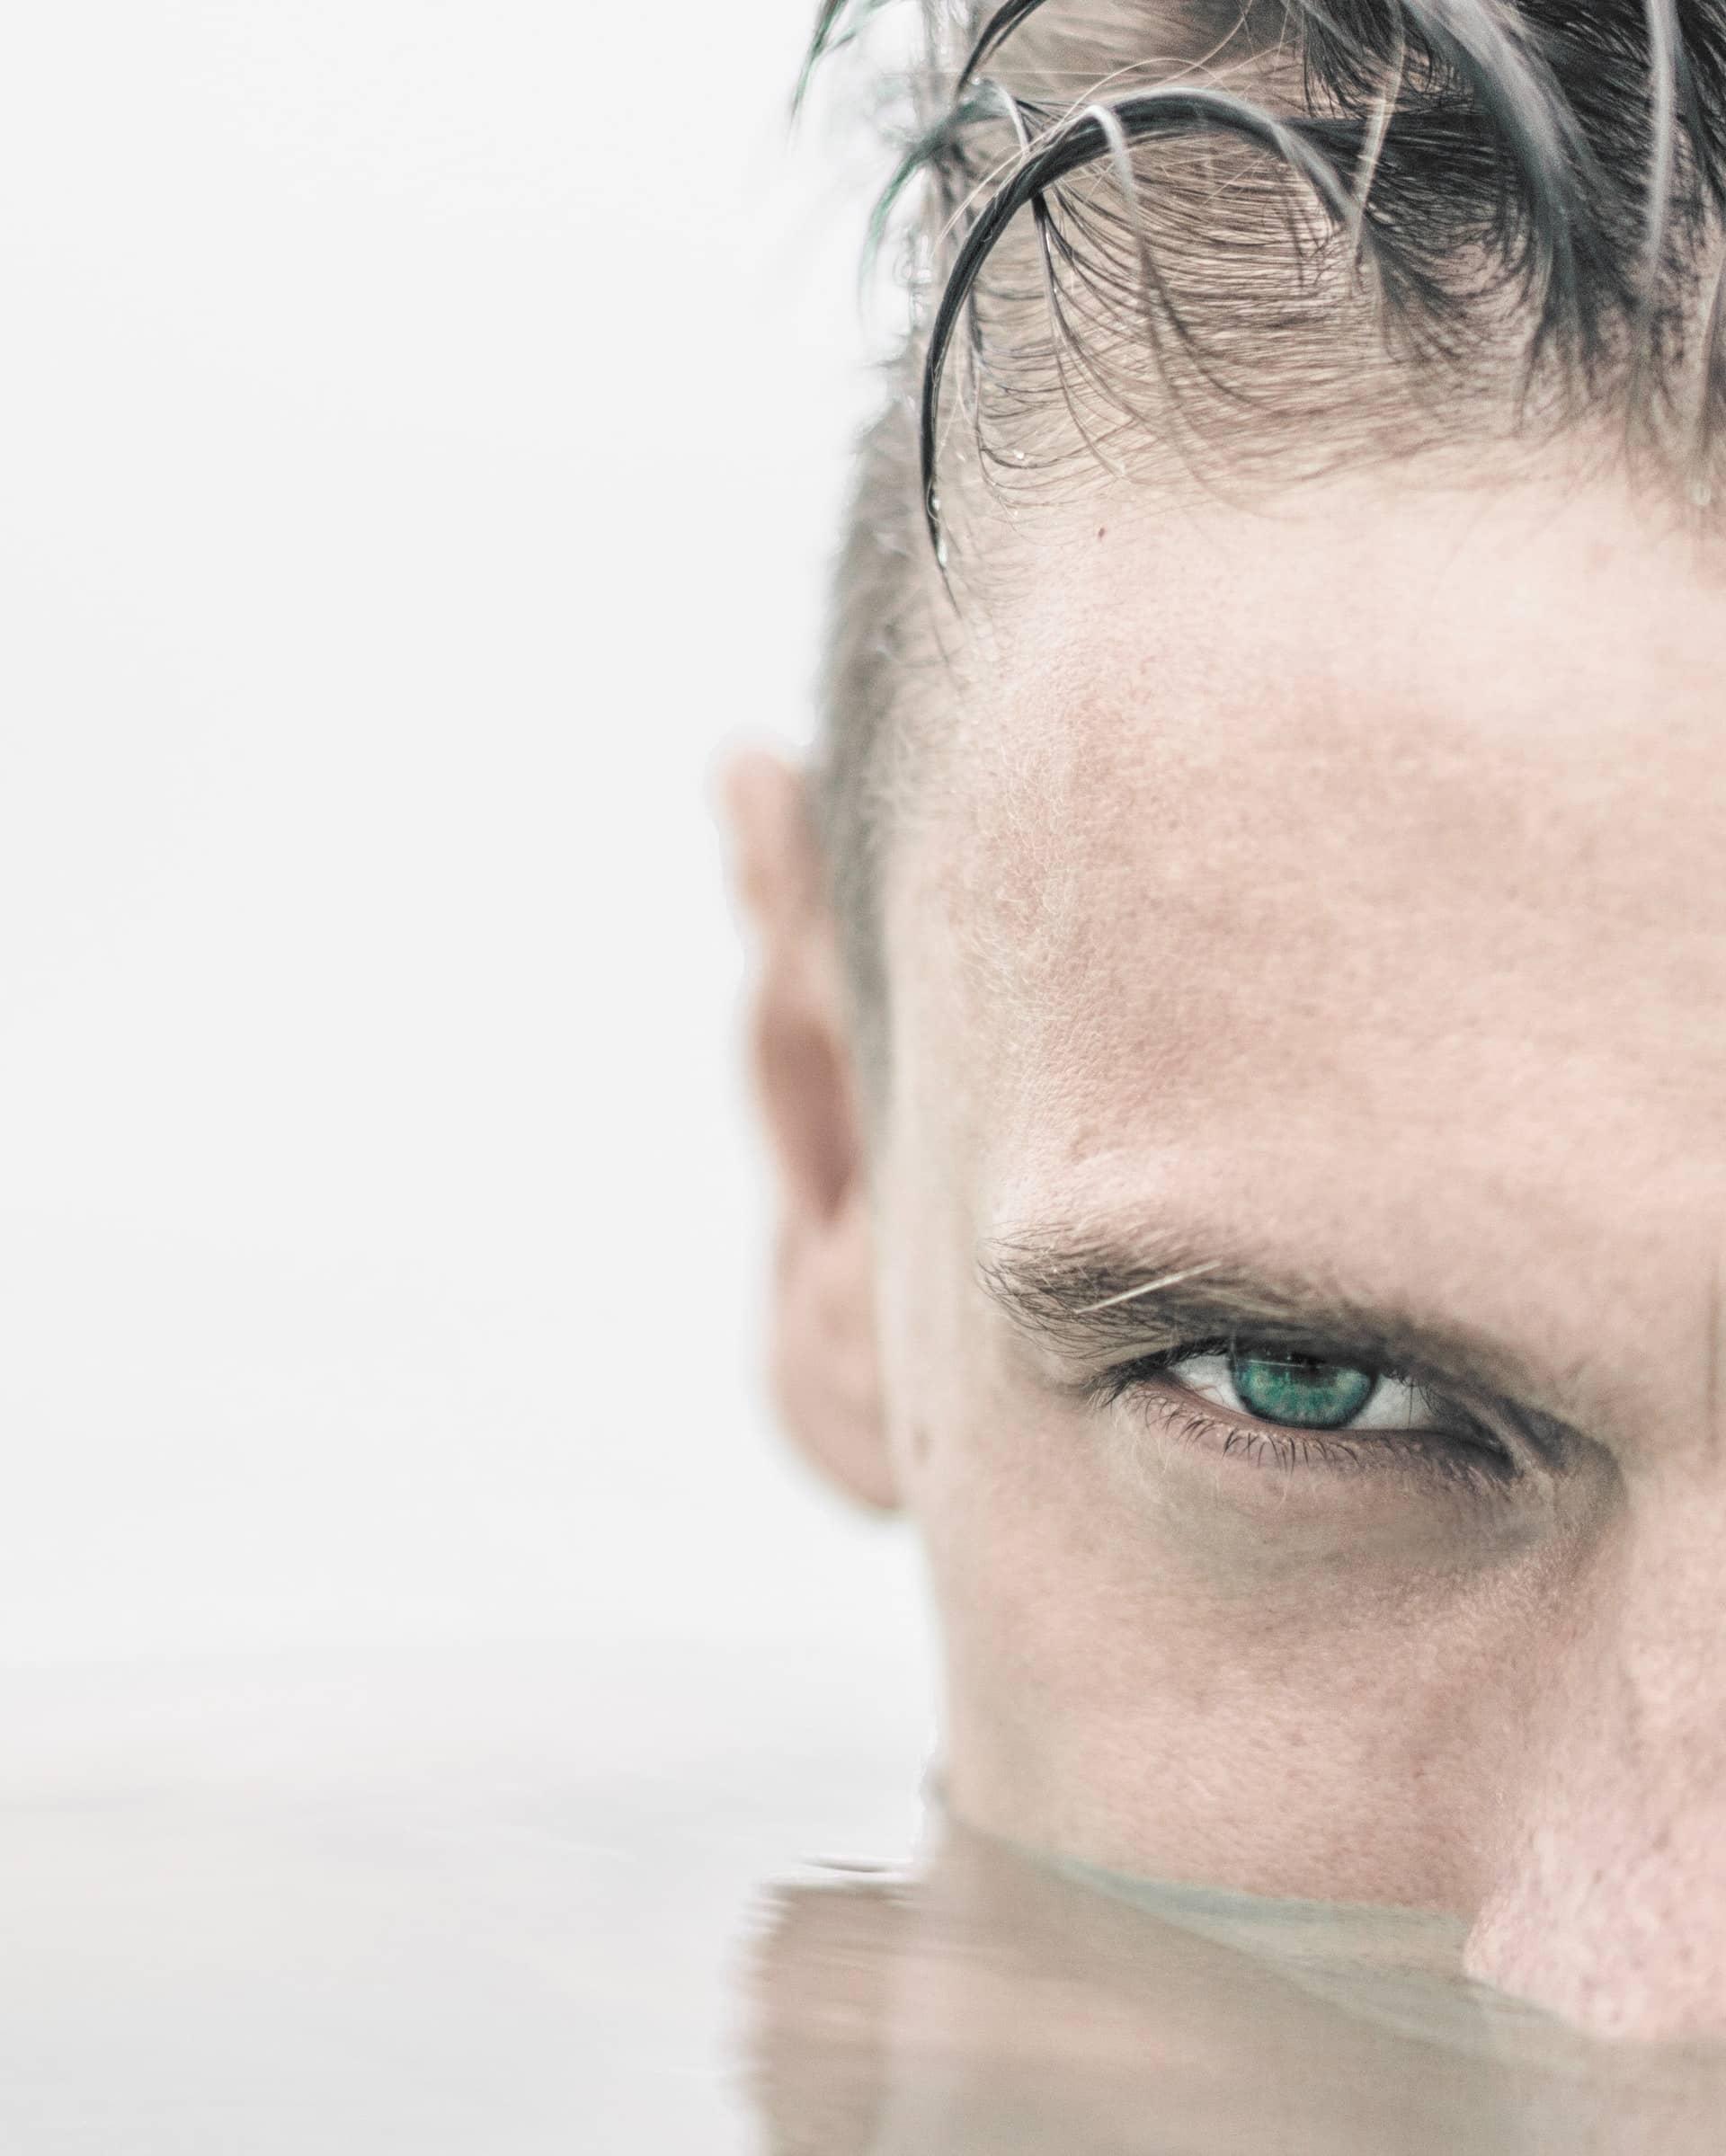 eye lid surgery for men in london, essex, kent